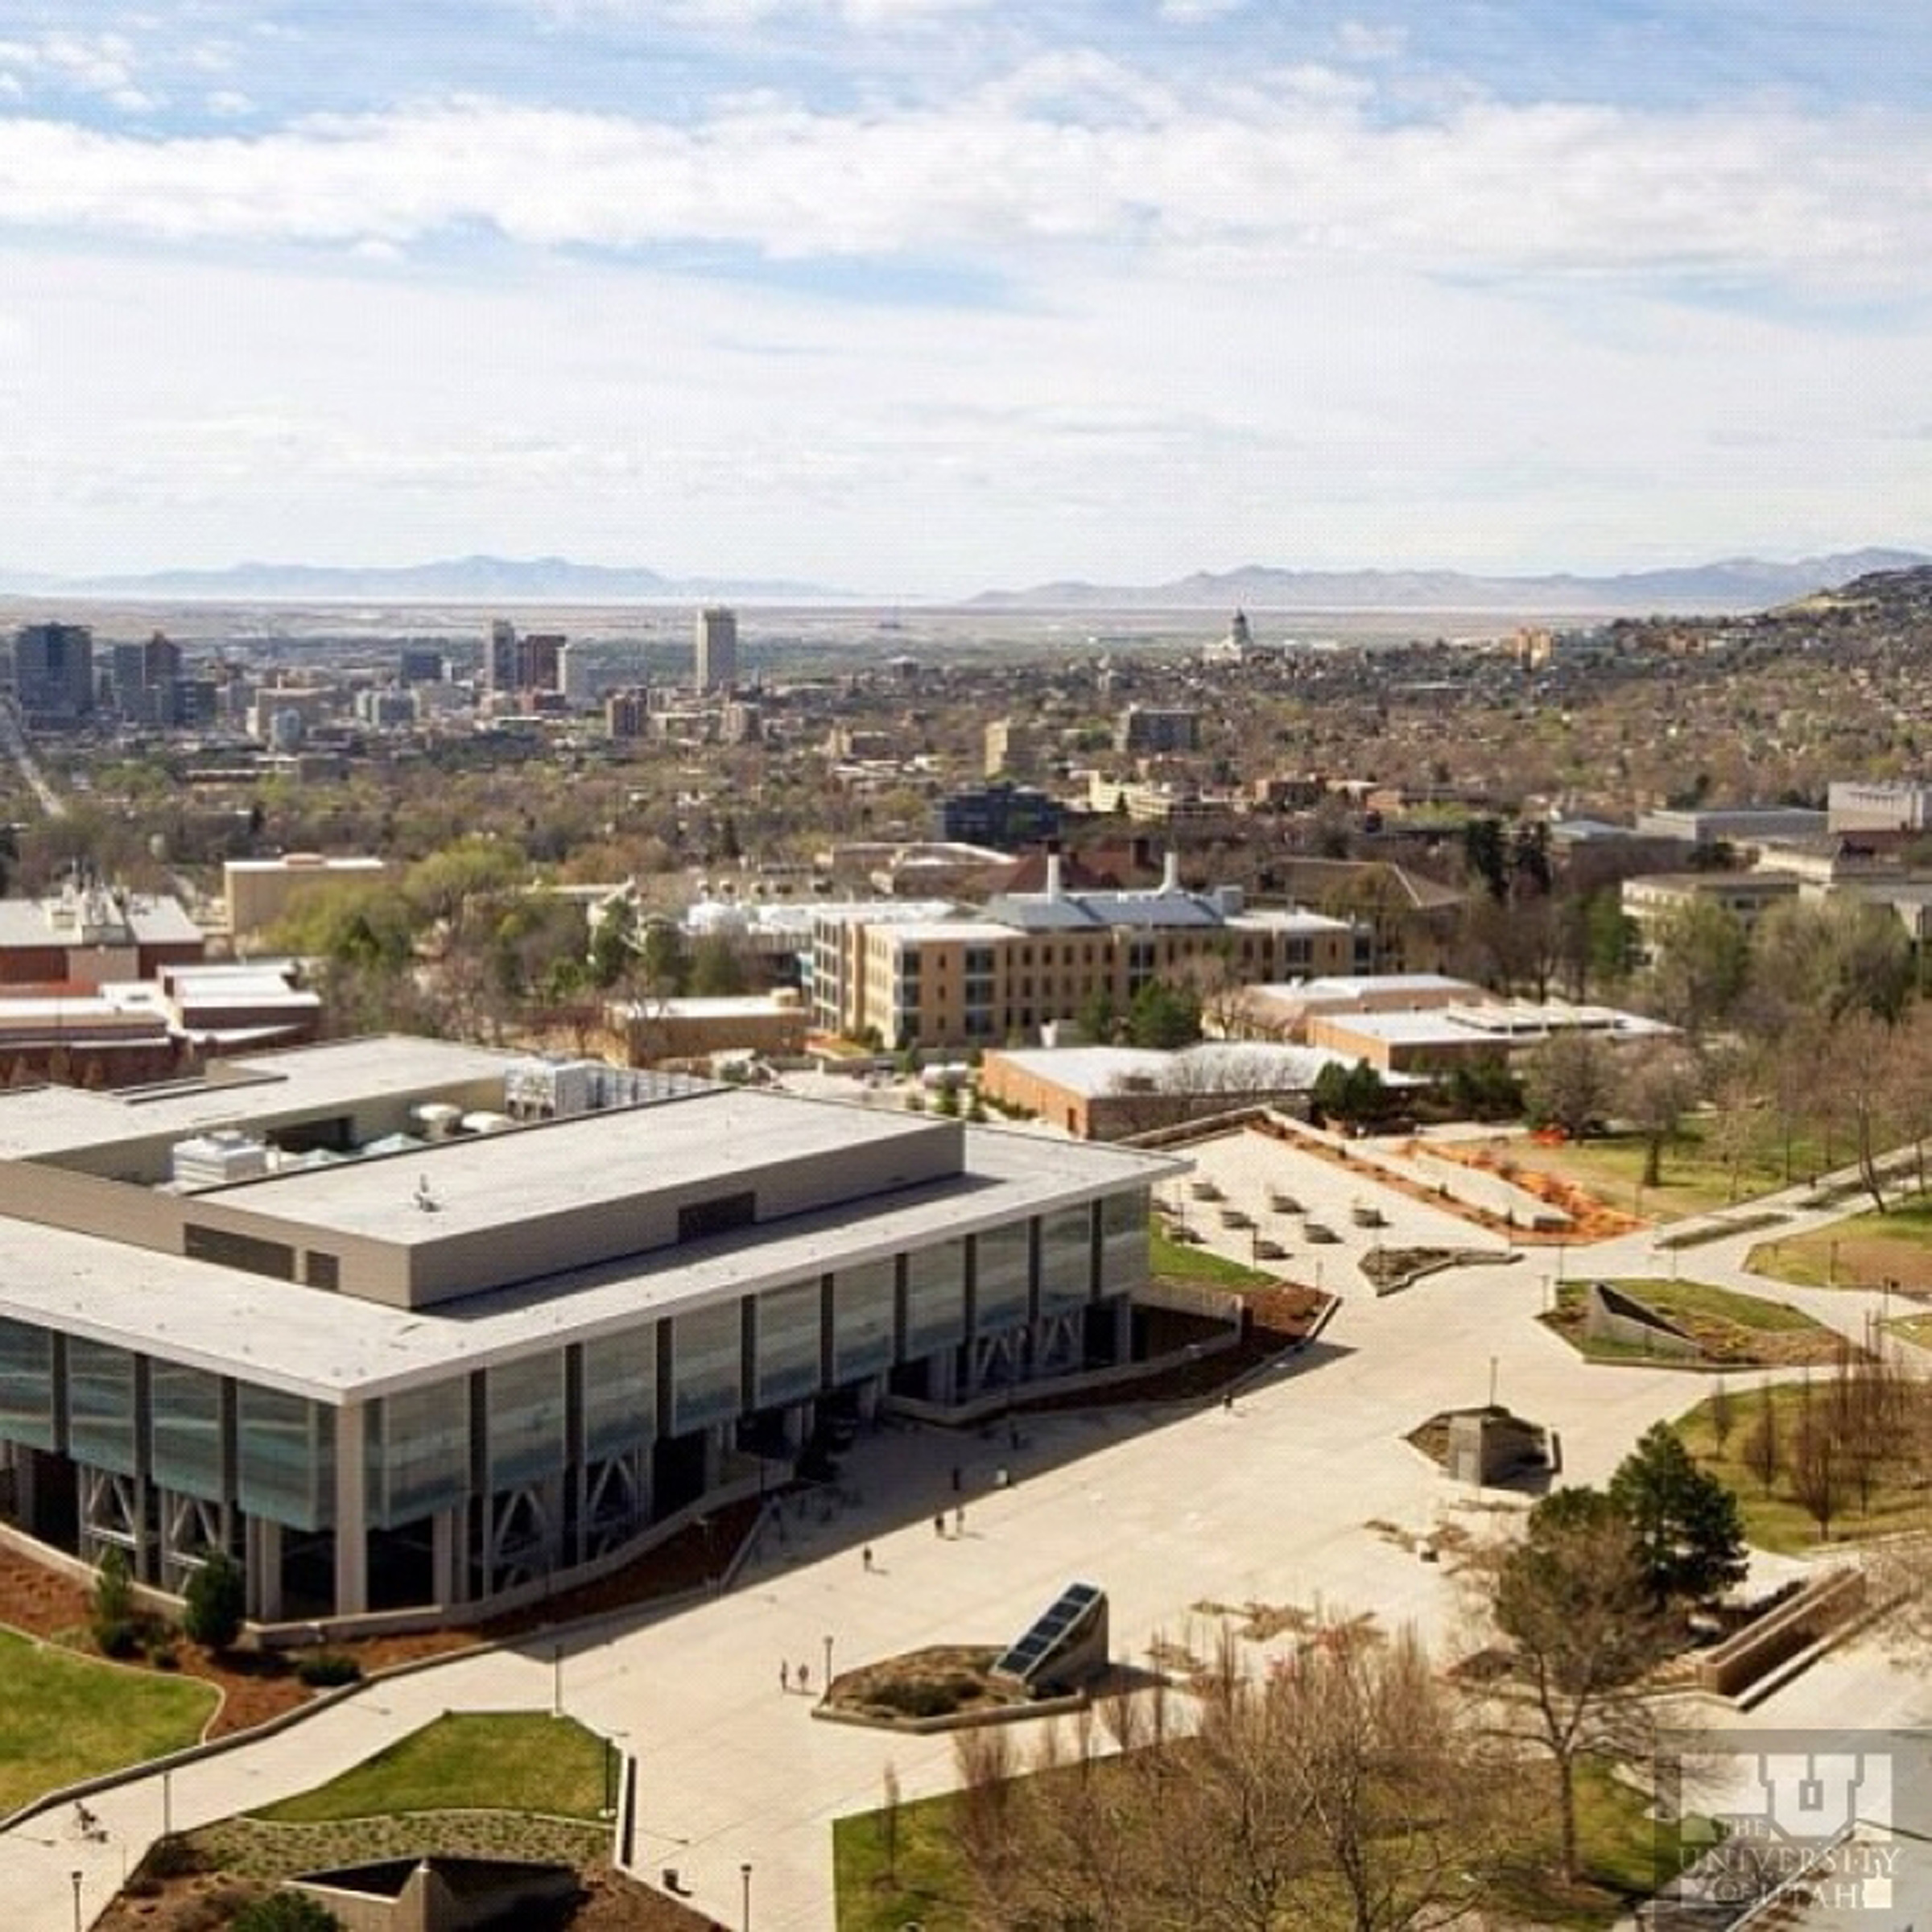 University of Utah Marriott Plaza and Salt Lake City.